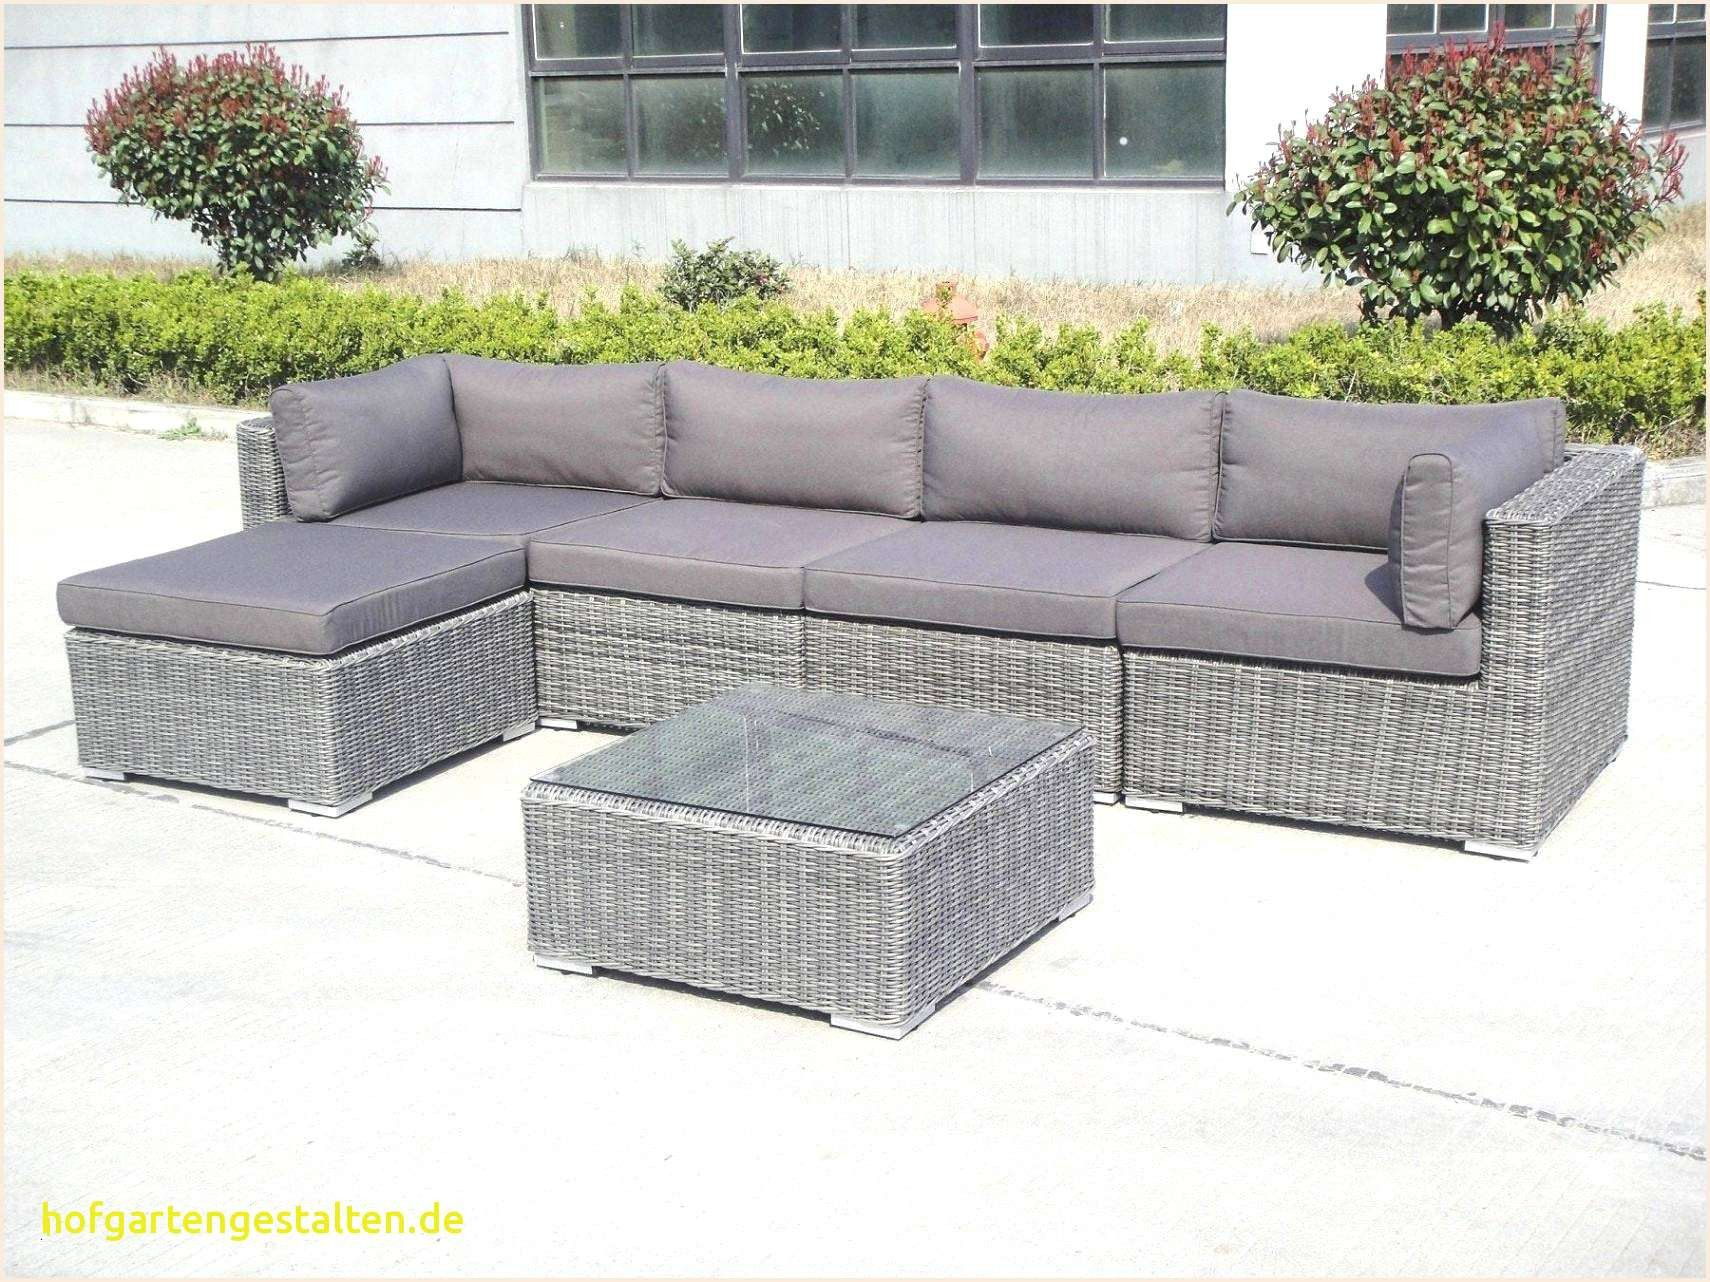 Design 41 Fur Gartenmobel Lounge Set Gunstig Check More At Https Www Estadoproperties Com Gartenmobel Gartenmobel Sets Gartenmobel Design Rattan Lounge Mobel